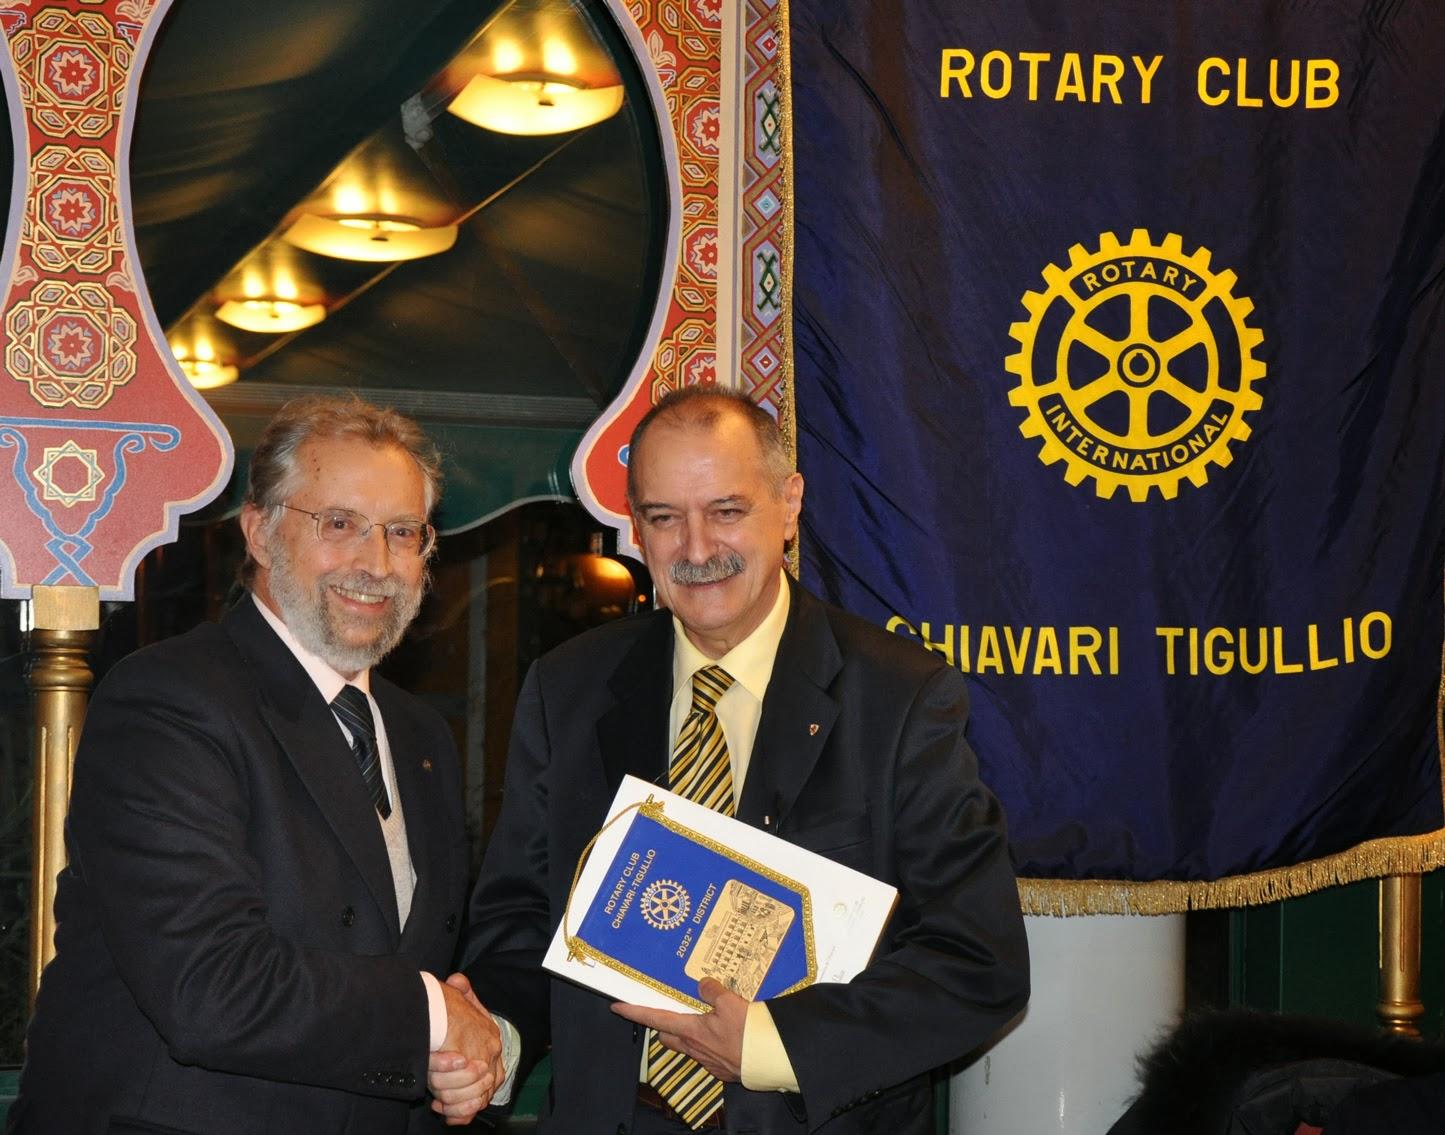 L Arte Di Salire Chiavari rotary club chiavari tigullio: 2013